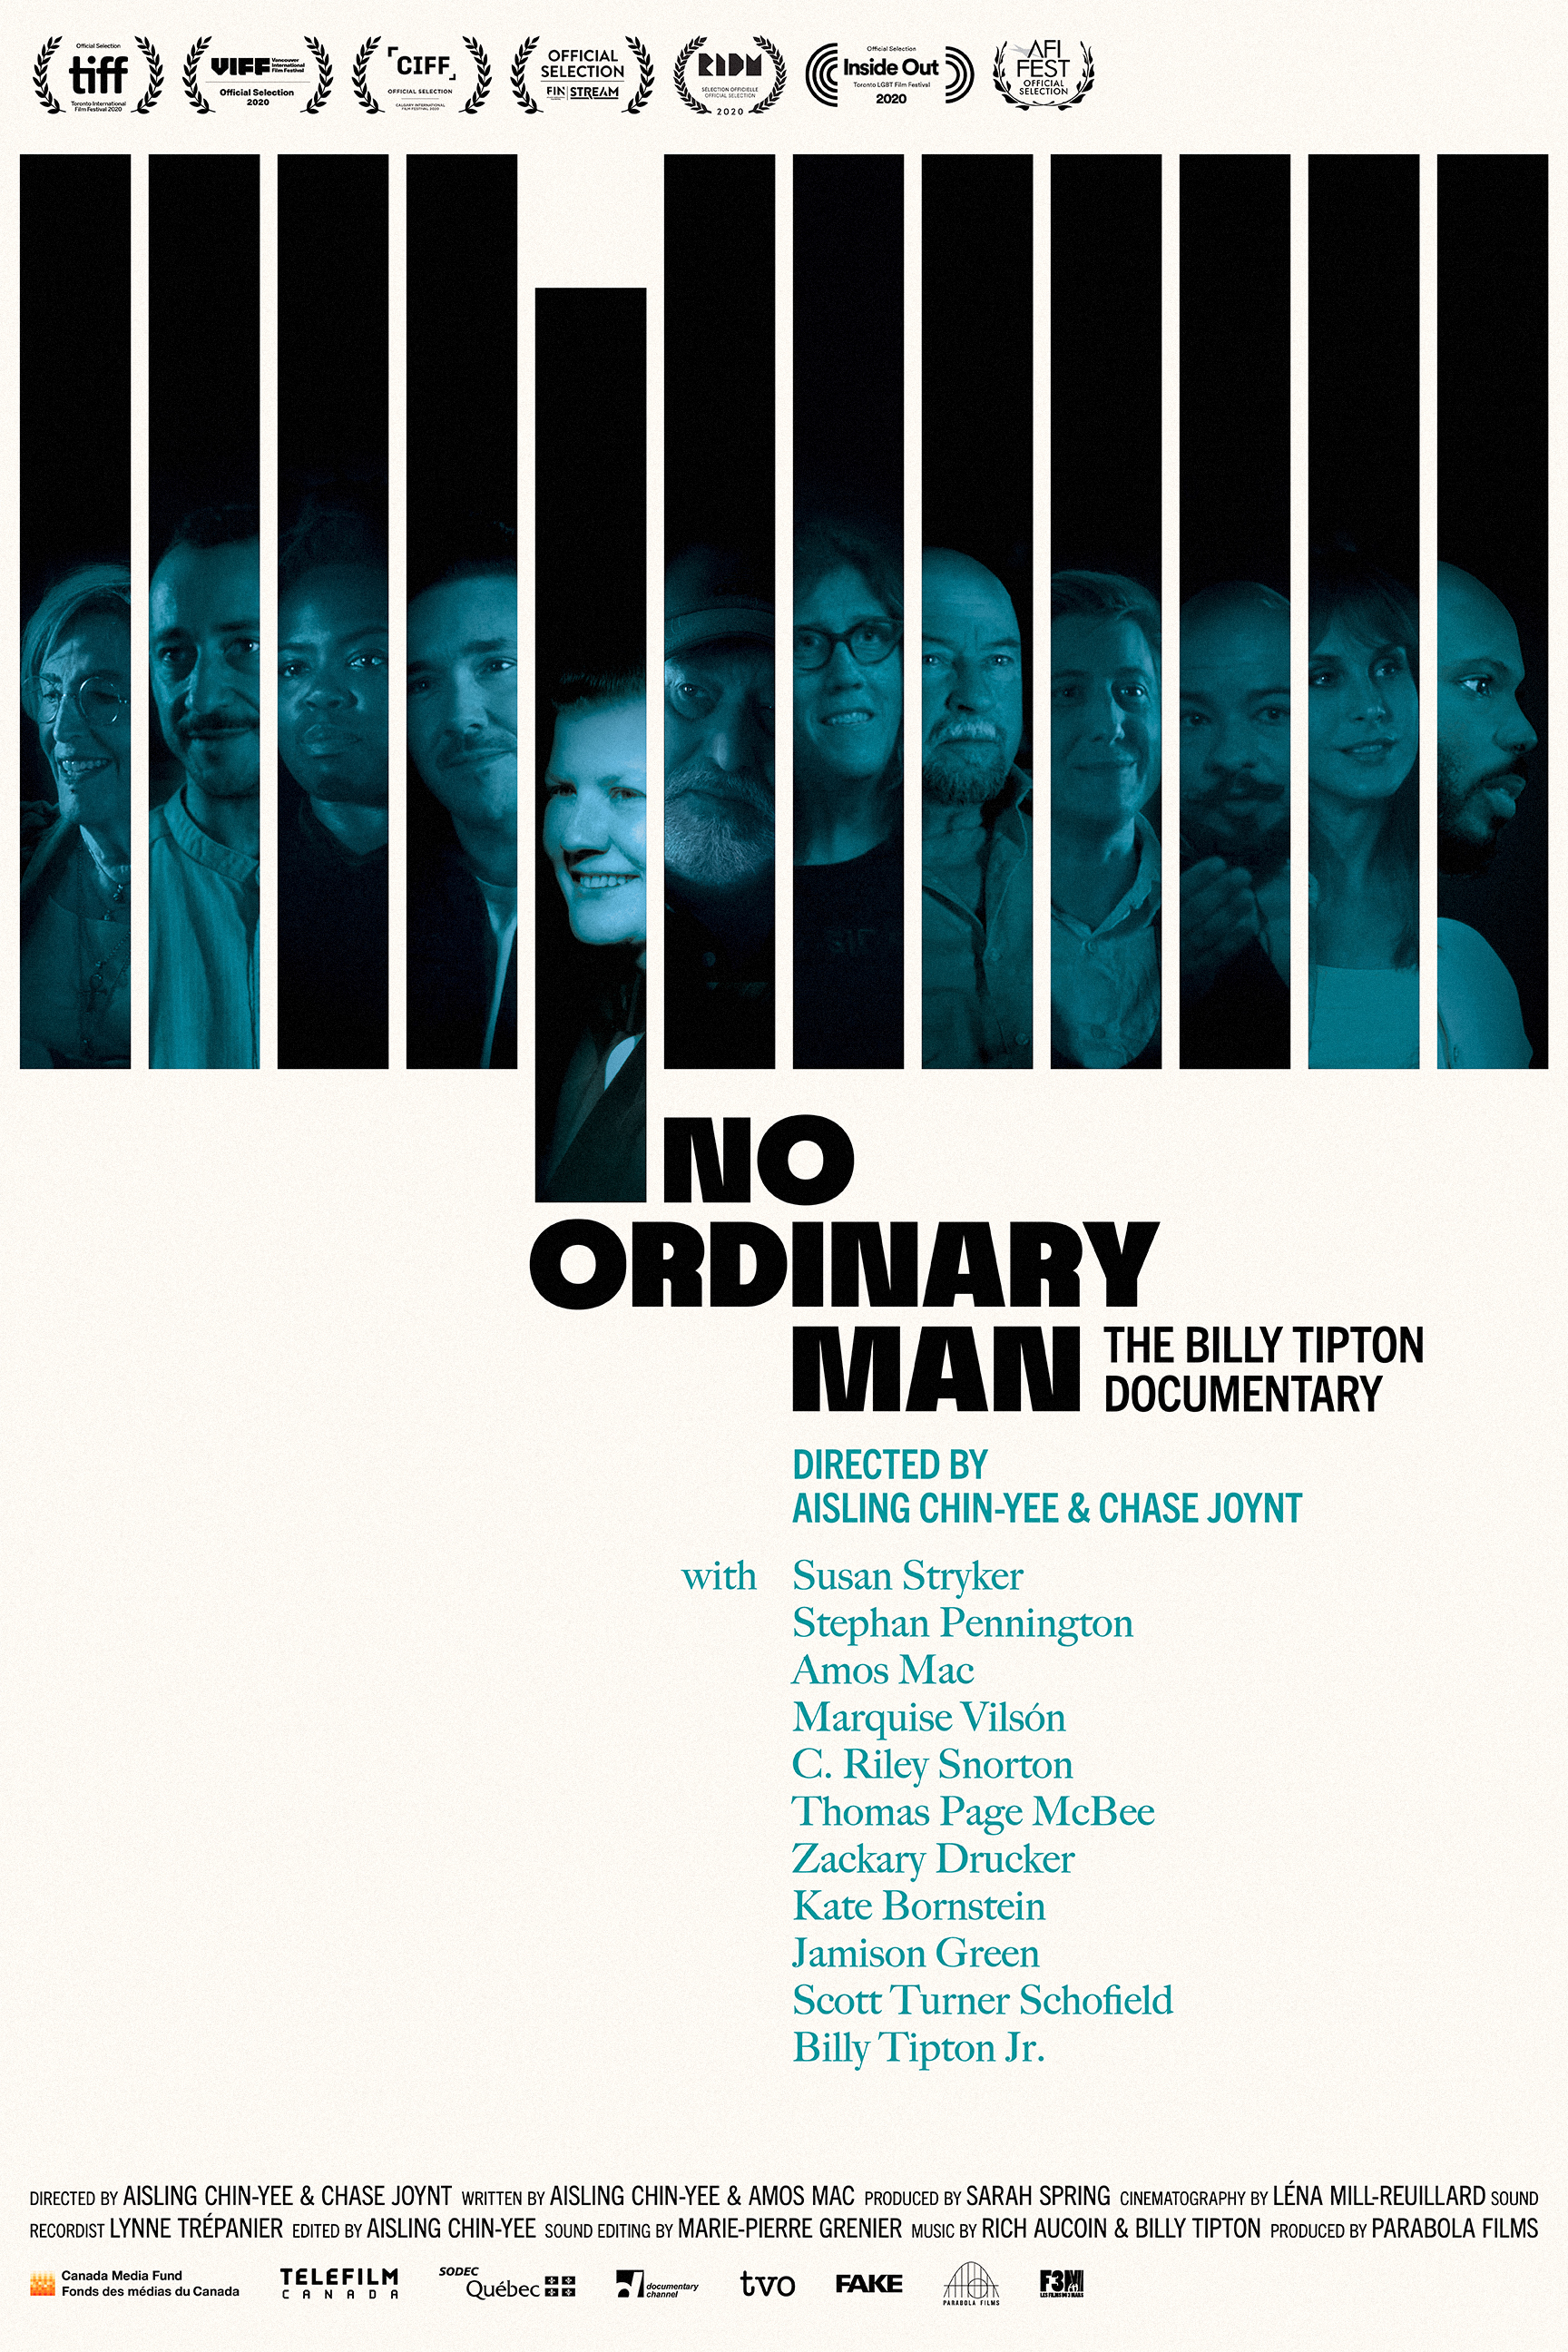 No Ordinary Man: The Billy Tipton Documentary